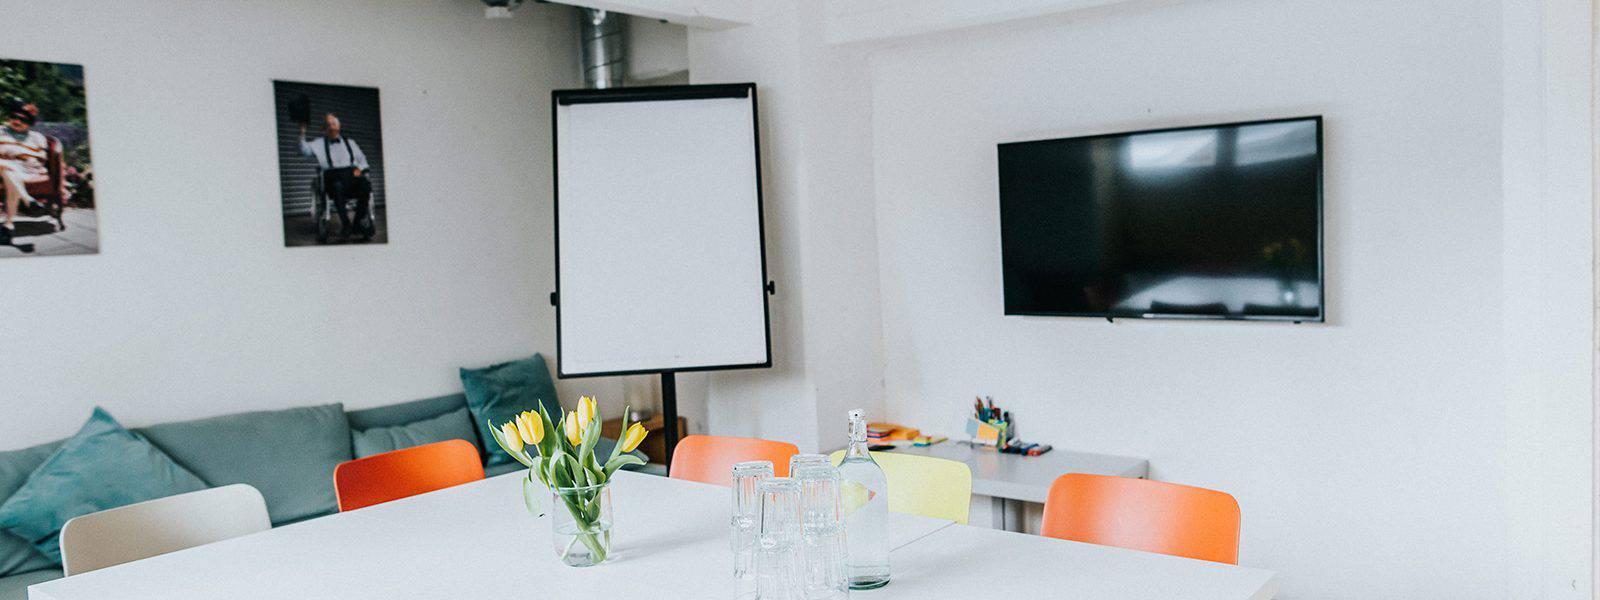 lounge meeting room at Impact Hub Vienna